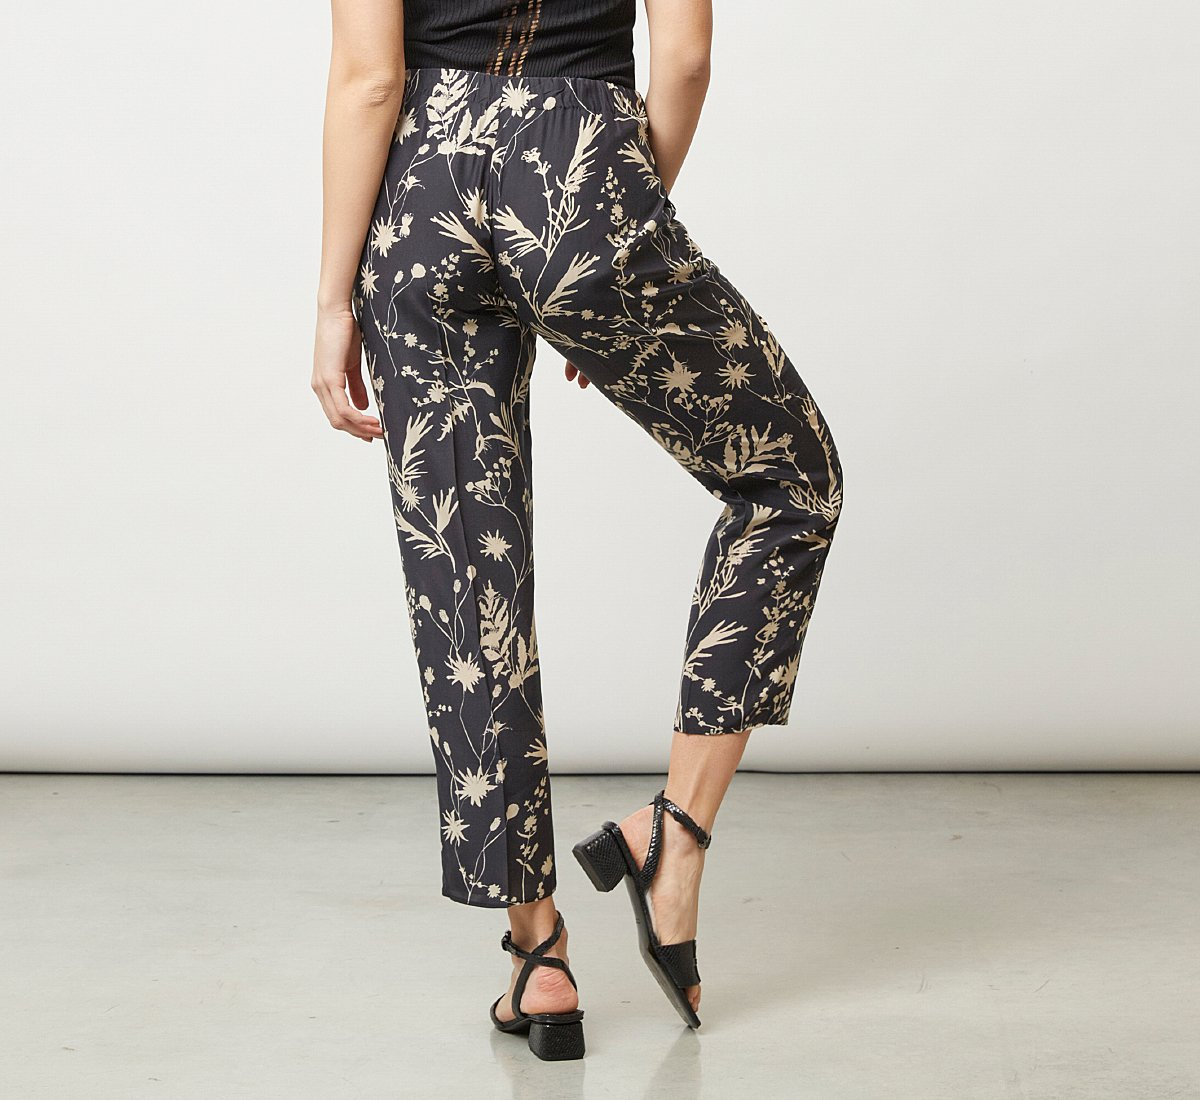 Pantalone morbido fantasia floreale